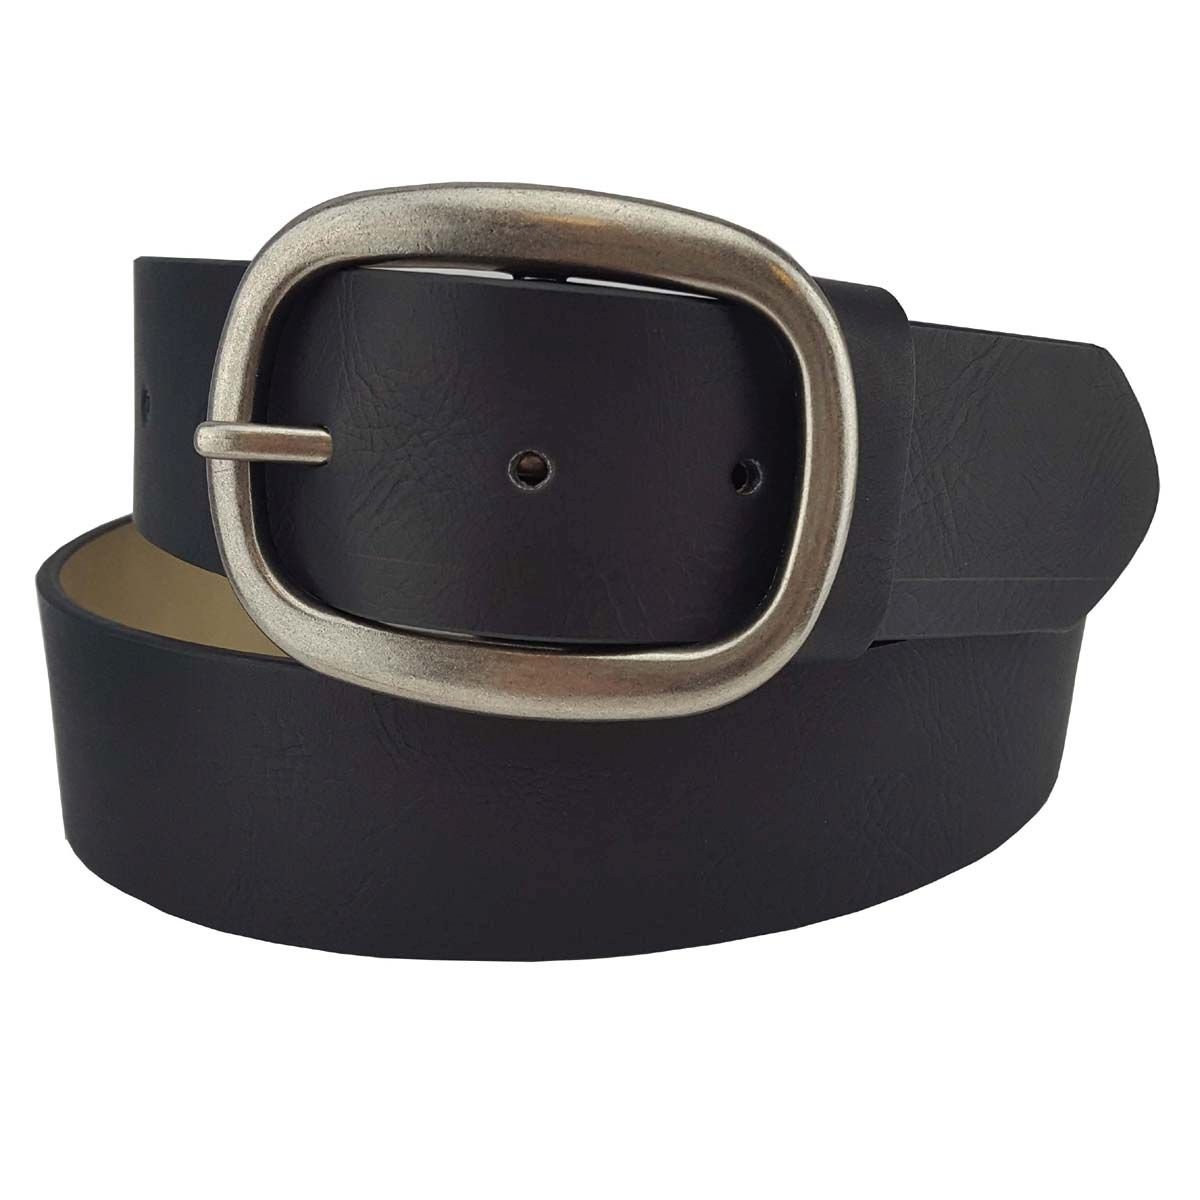 Vegan Plain Belt in Black XL